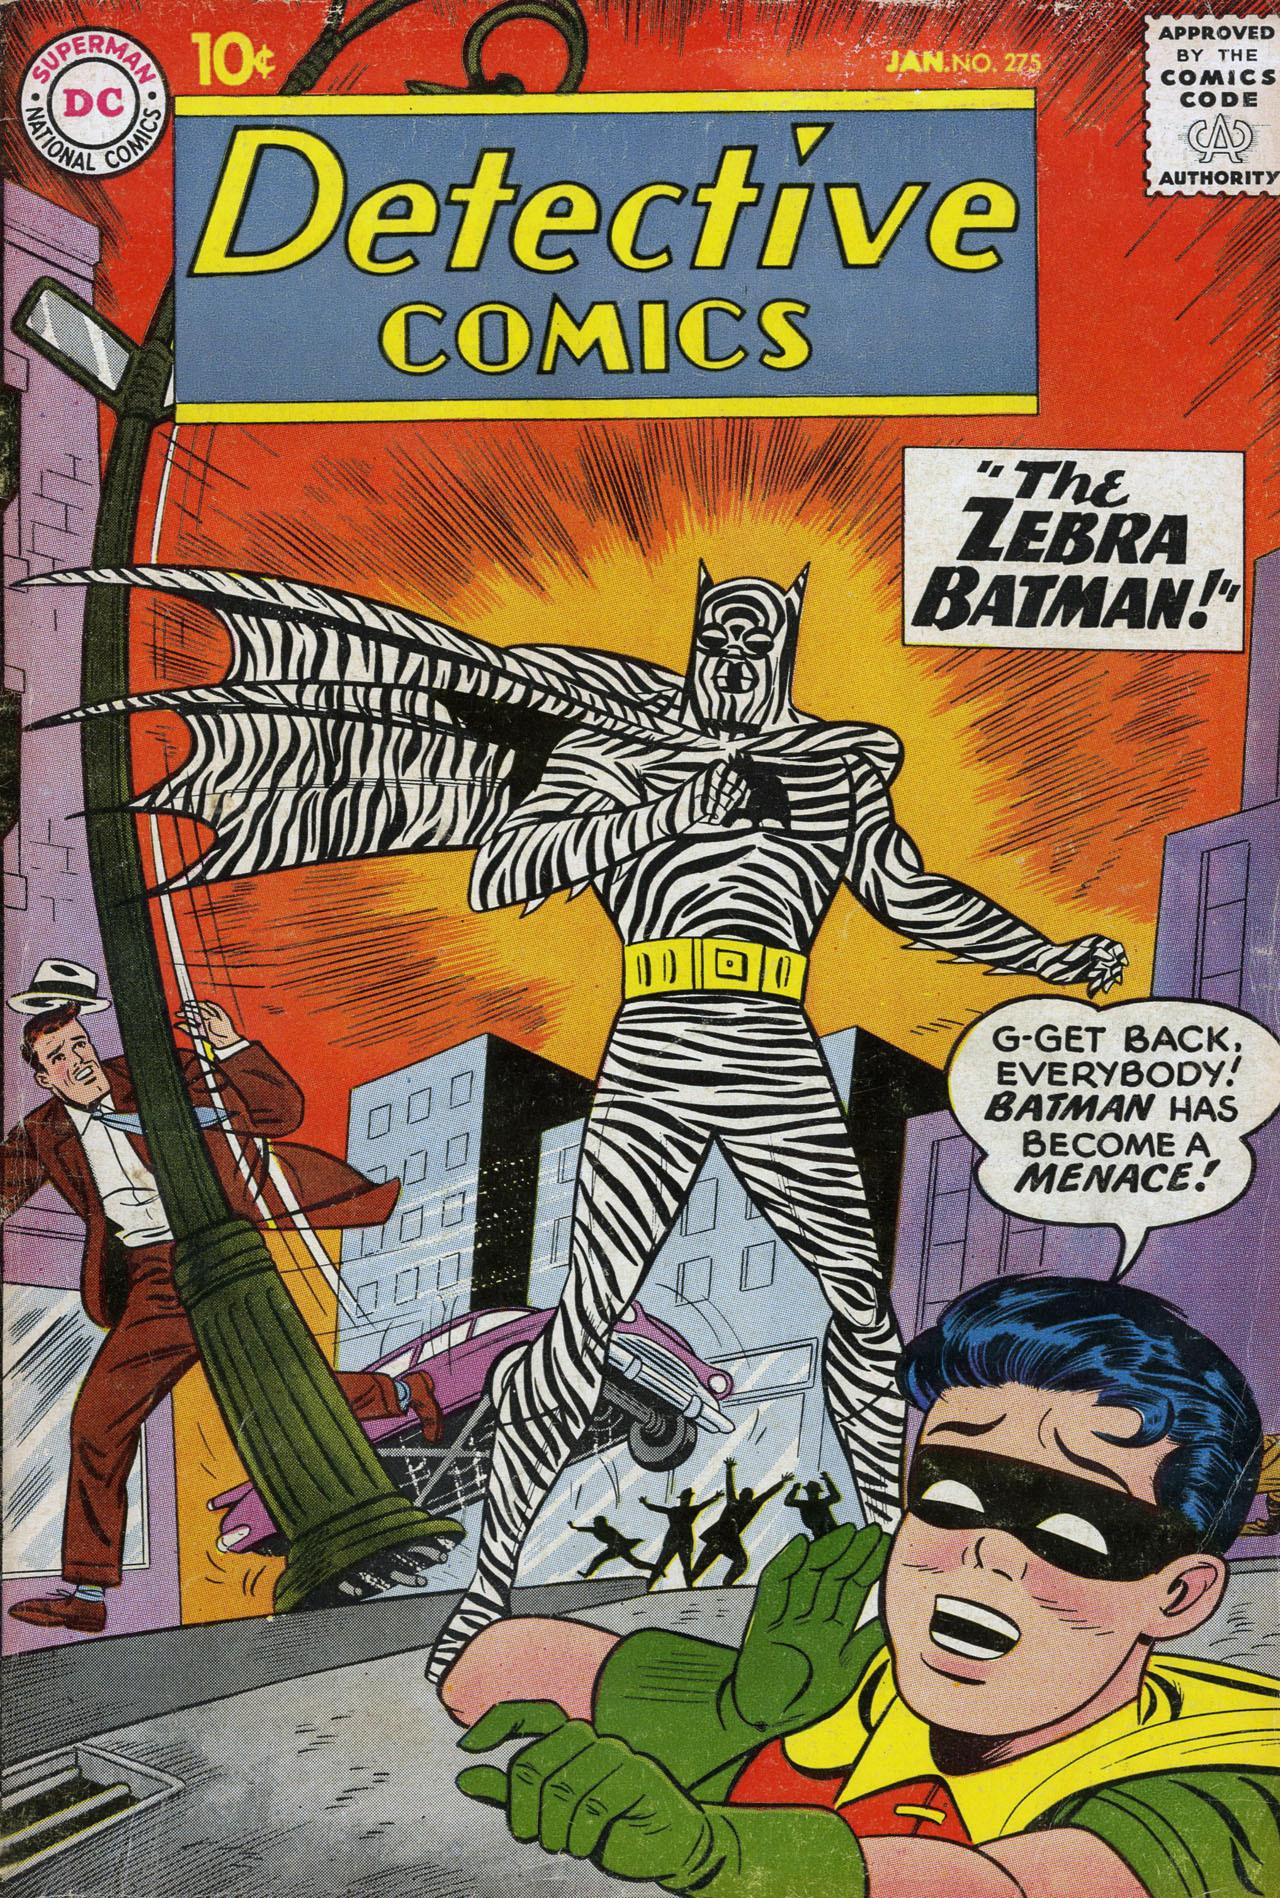 comicbookcovers:  Detective Comics #275, January 1960, cover by Sheldon Moldoff  BATMAN has become a MENACE! A fabulous, fabulous menace.